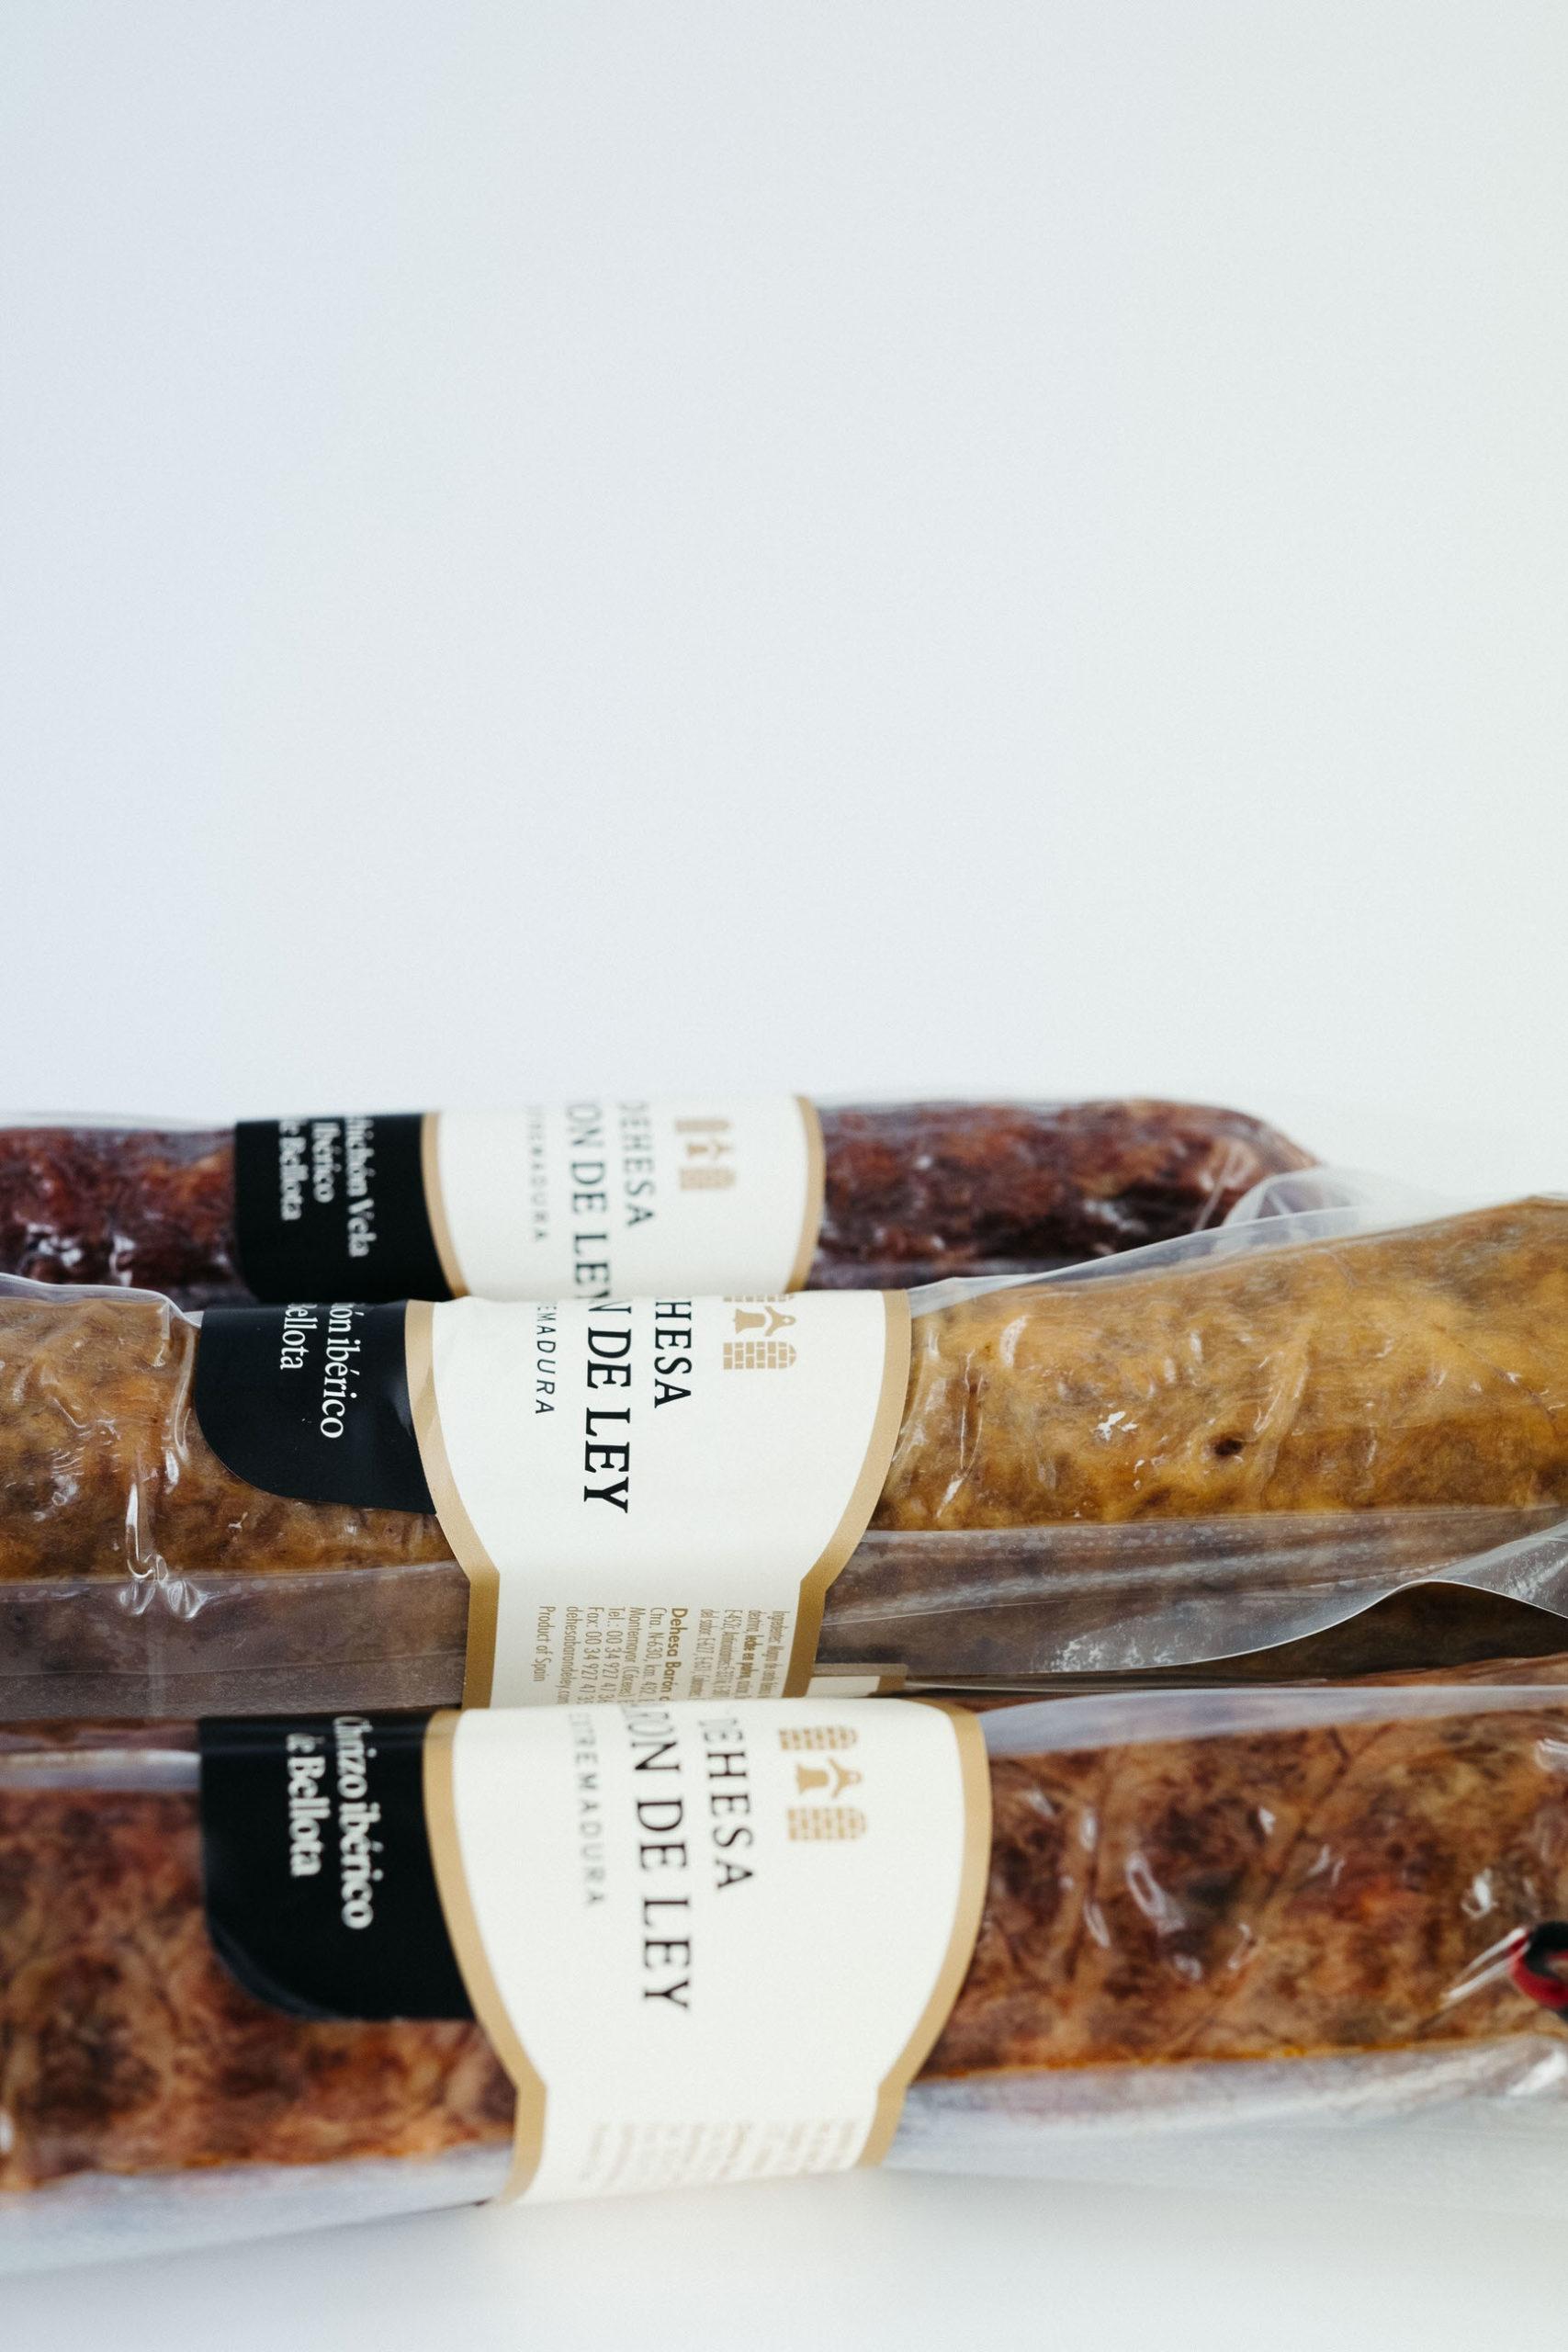 Chorizo iberico Dehesa Baron de ley